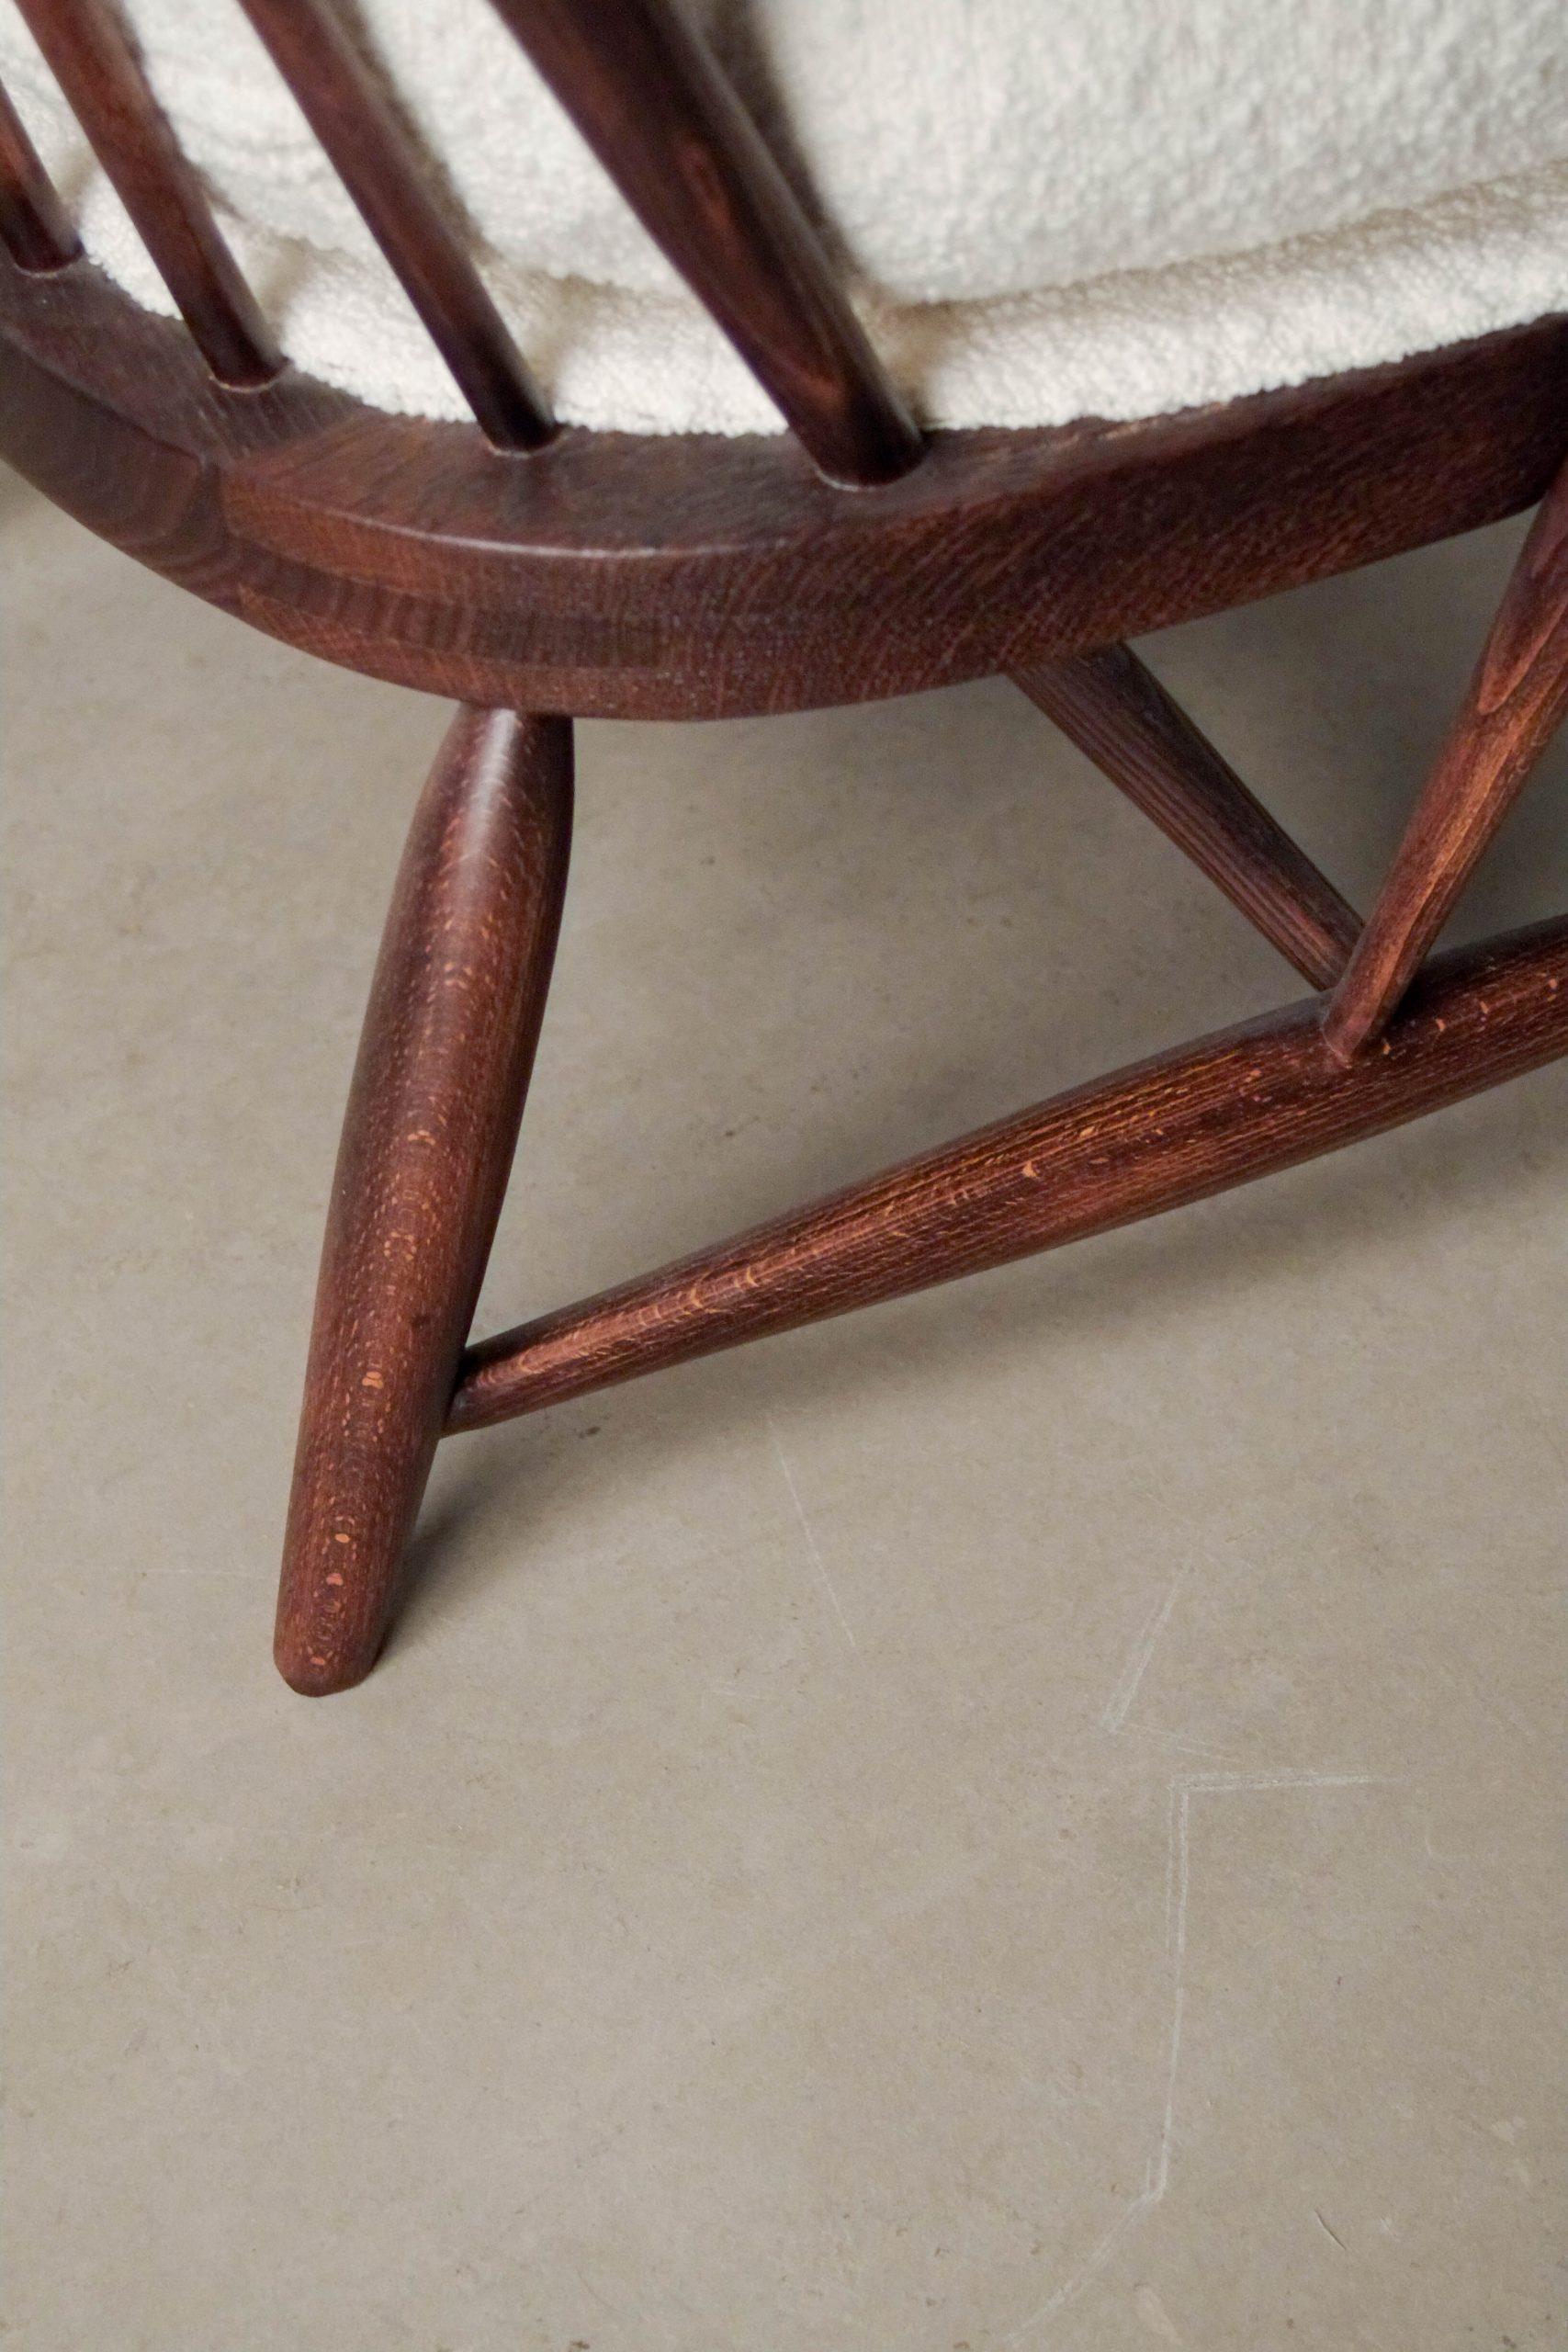 detalle de madera de pata madera de olmo haya diseño ebanista